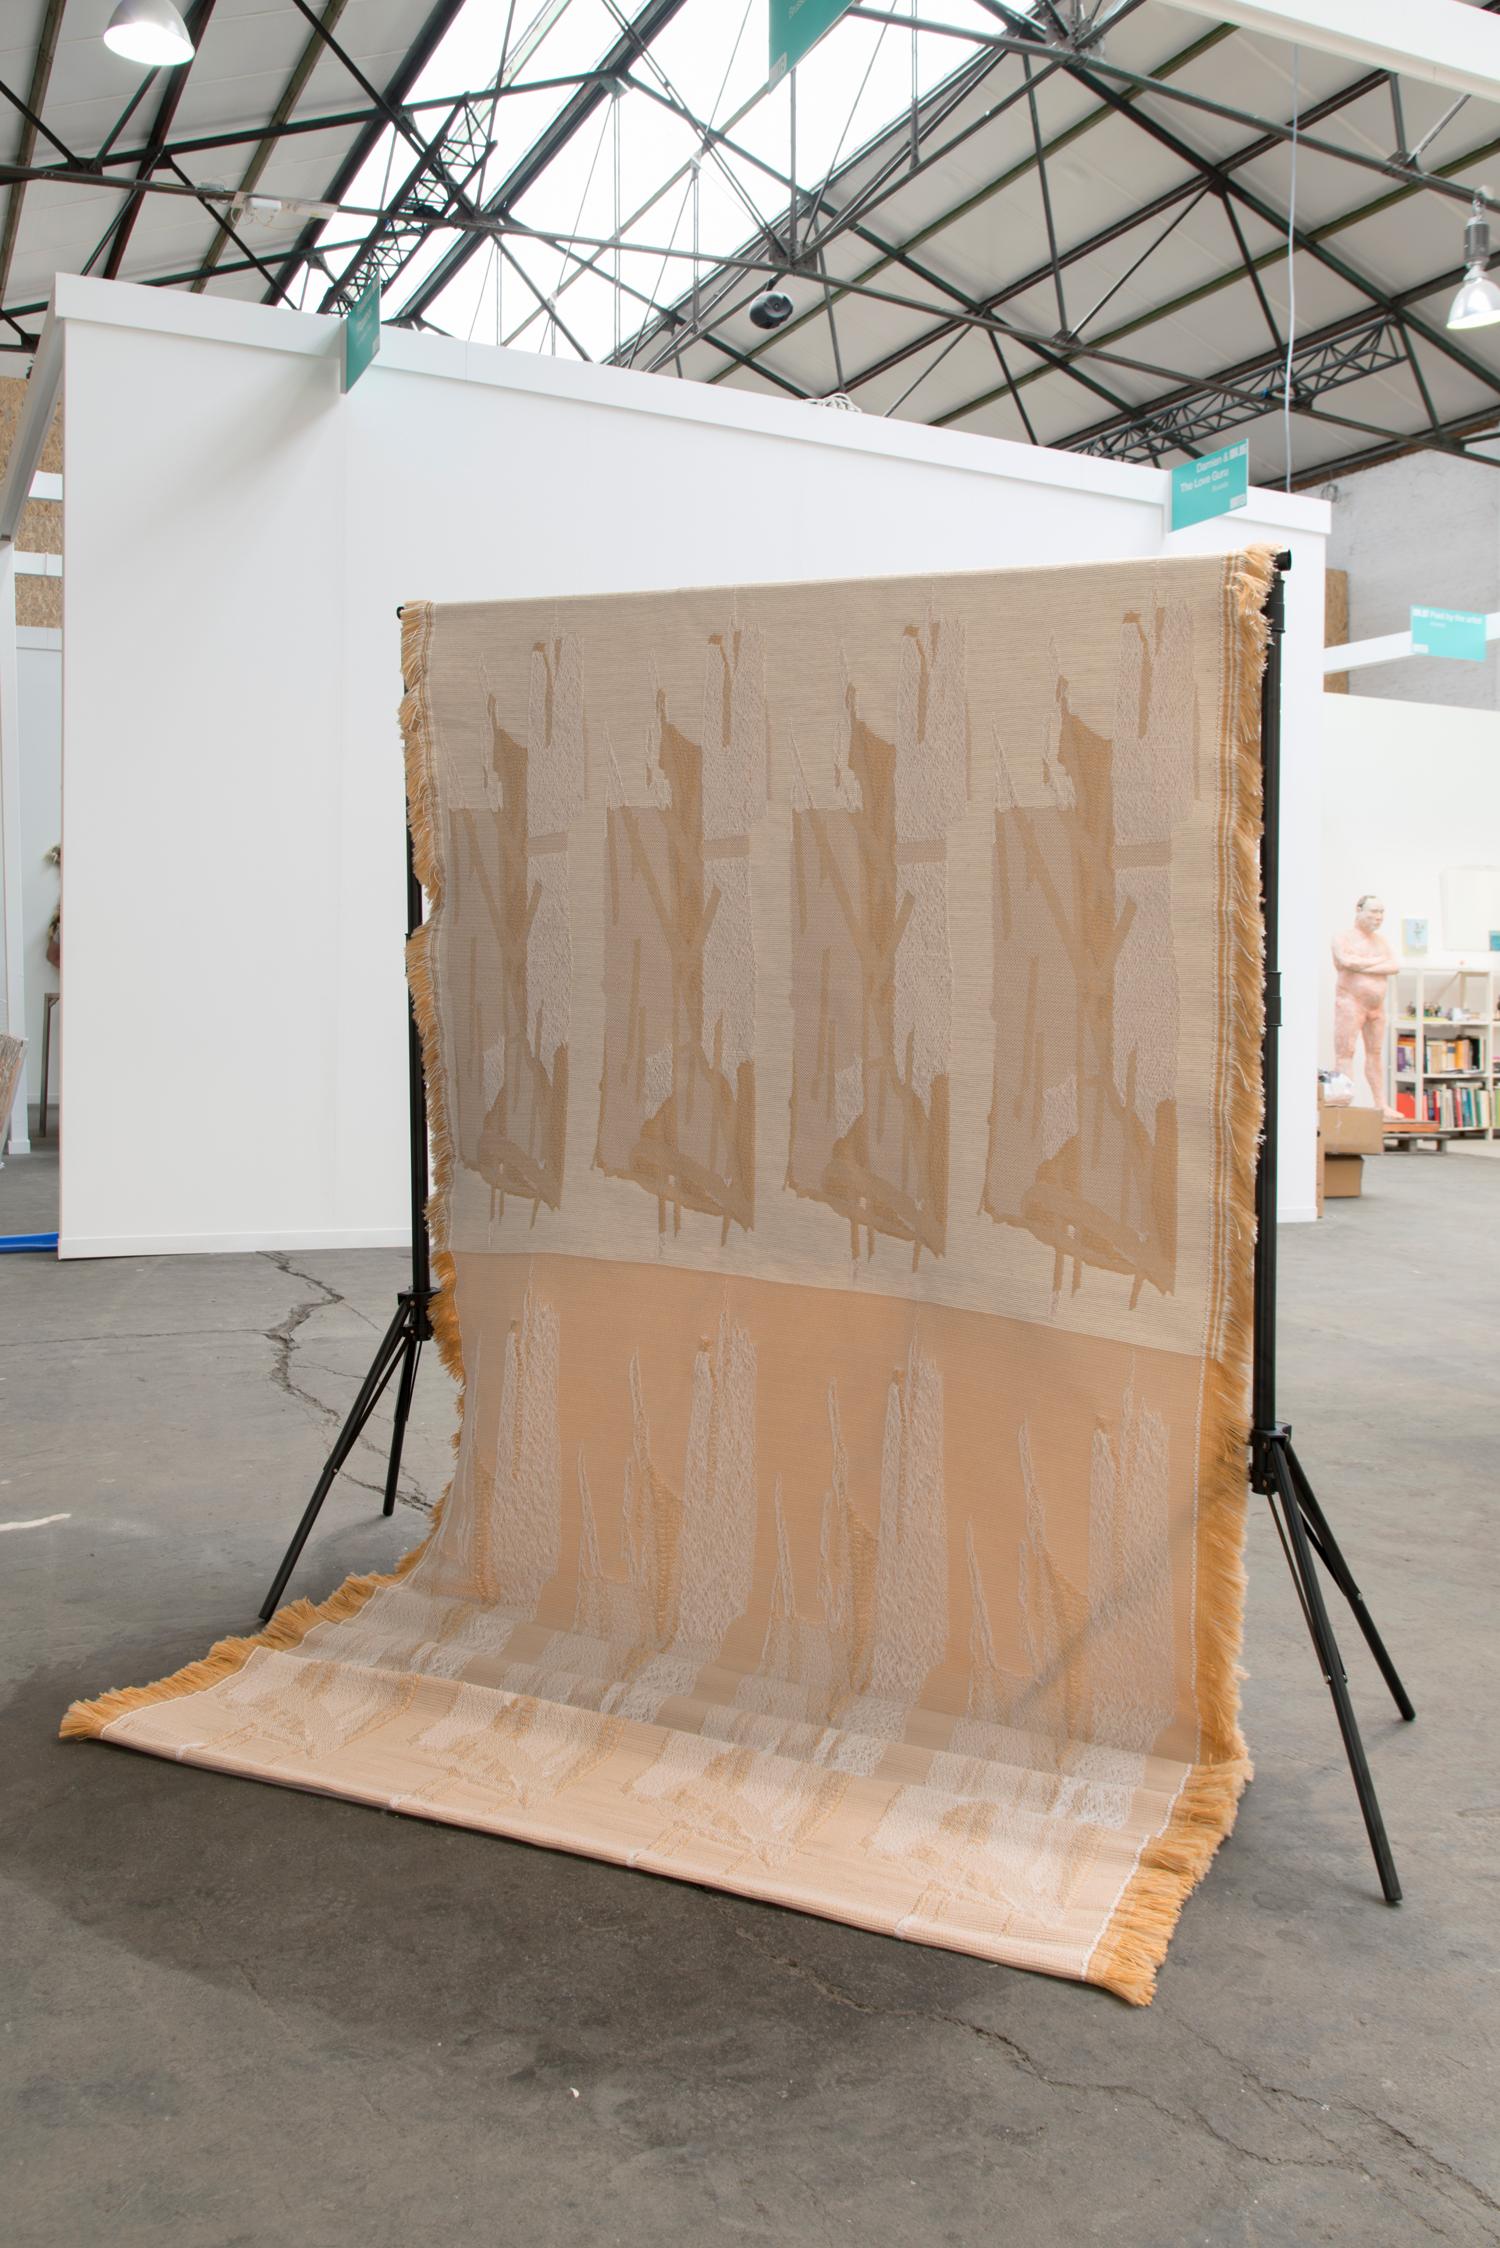 Softwares 2019 Hana Miletić  Double Jacquard-woven textile manipulated by hand (white polyester, skin colored polyamide, beige polyamide, white wool and silk), textile: 150x400x0.5cm Courtesy of the artist and LambdaLambdaLambda, Prishtina   Photo: Isabelle Arthuis